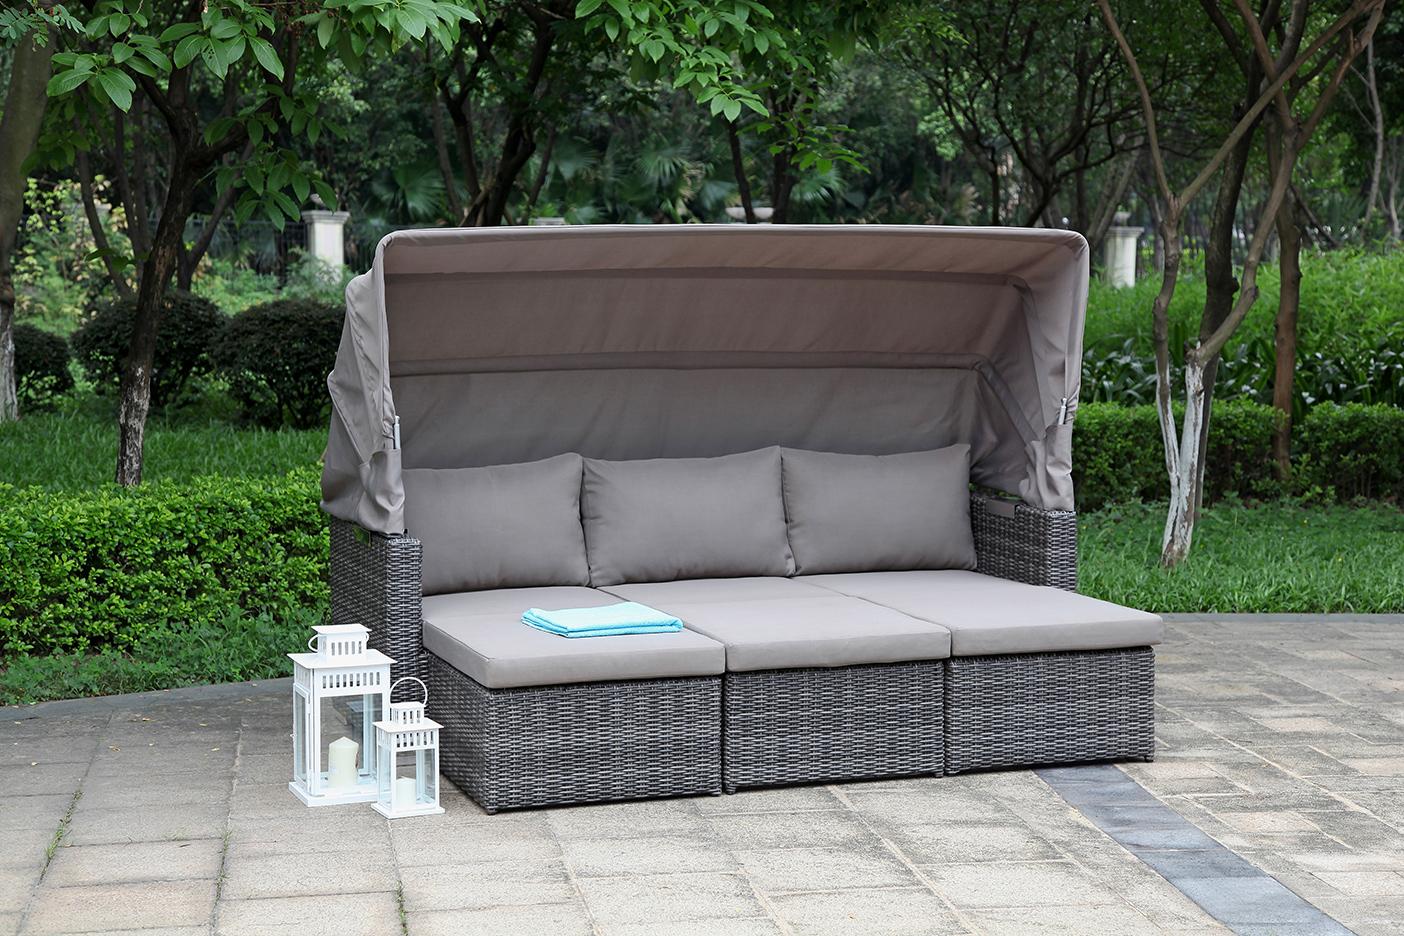 Holz-Schröer Gartenmöbel – Lounge